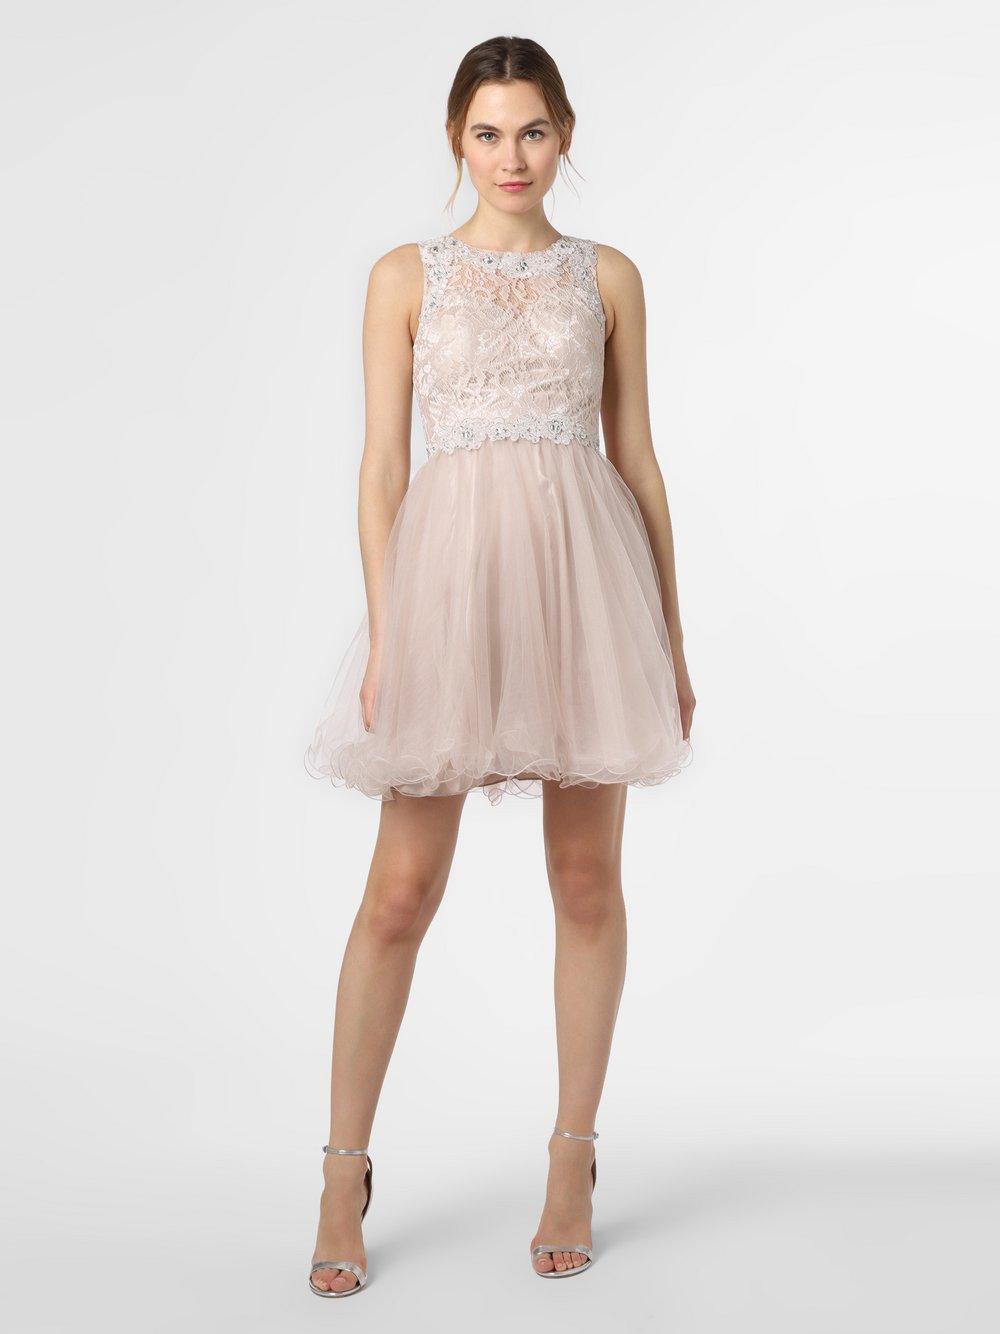 Laona – Damska sukienka wieczorowa, beżowy Van Graaf 472450-0001-00320